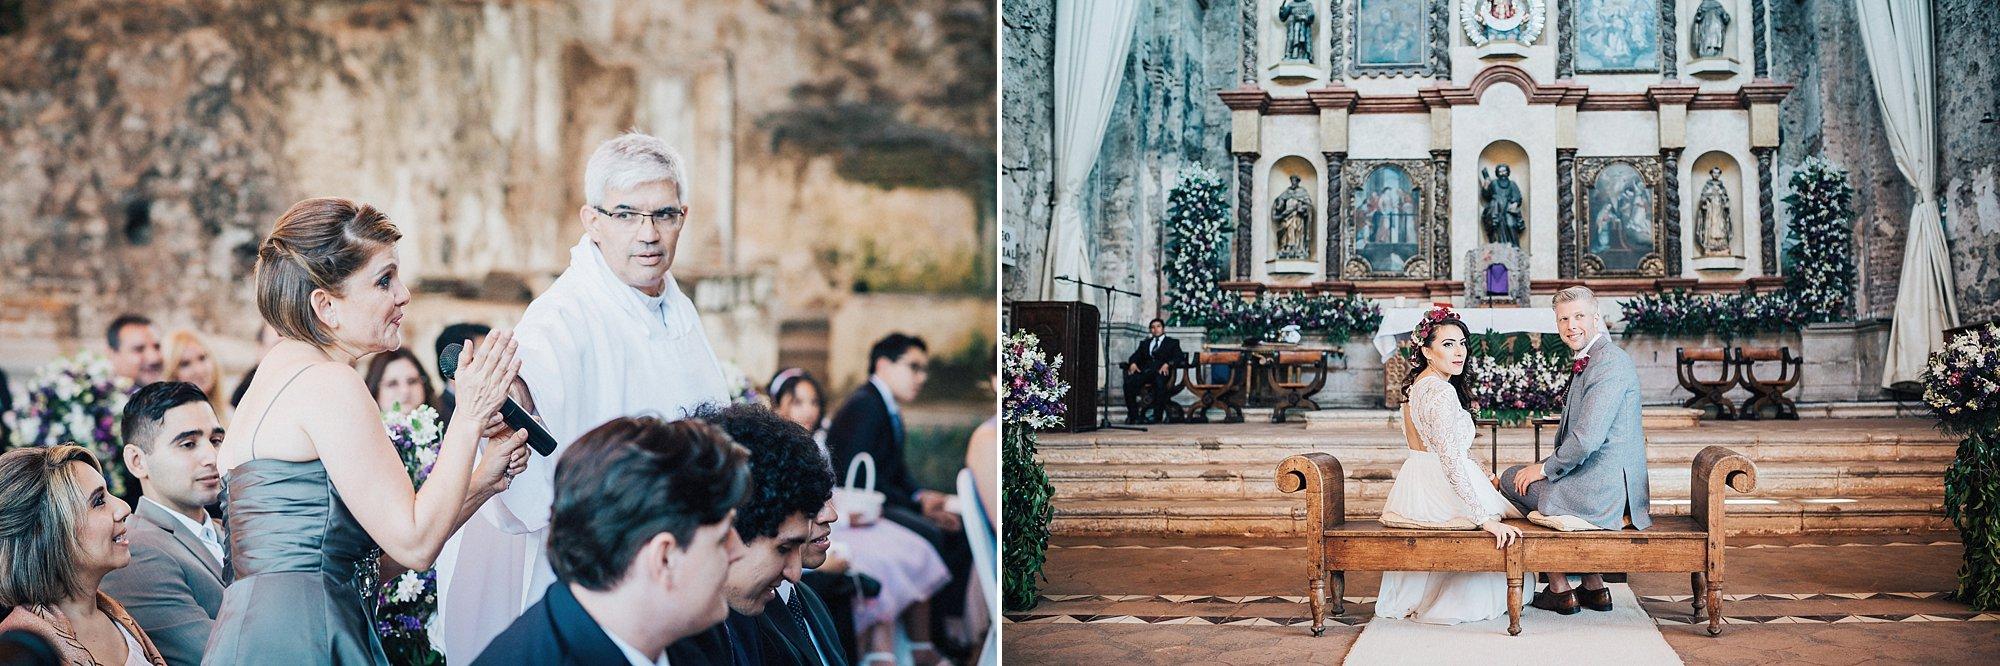 alex-yazmin-wedding-photographer-antigua-guatemala-076